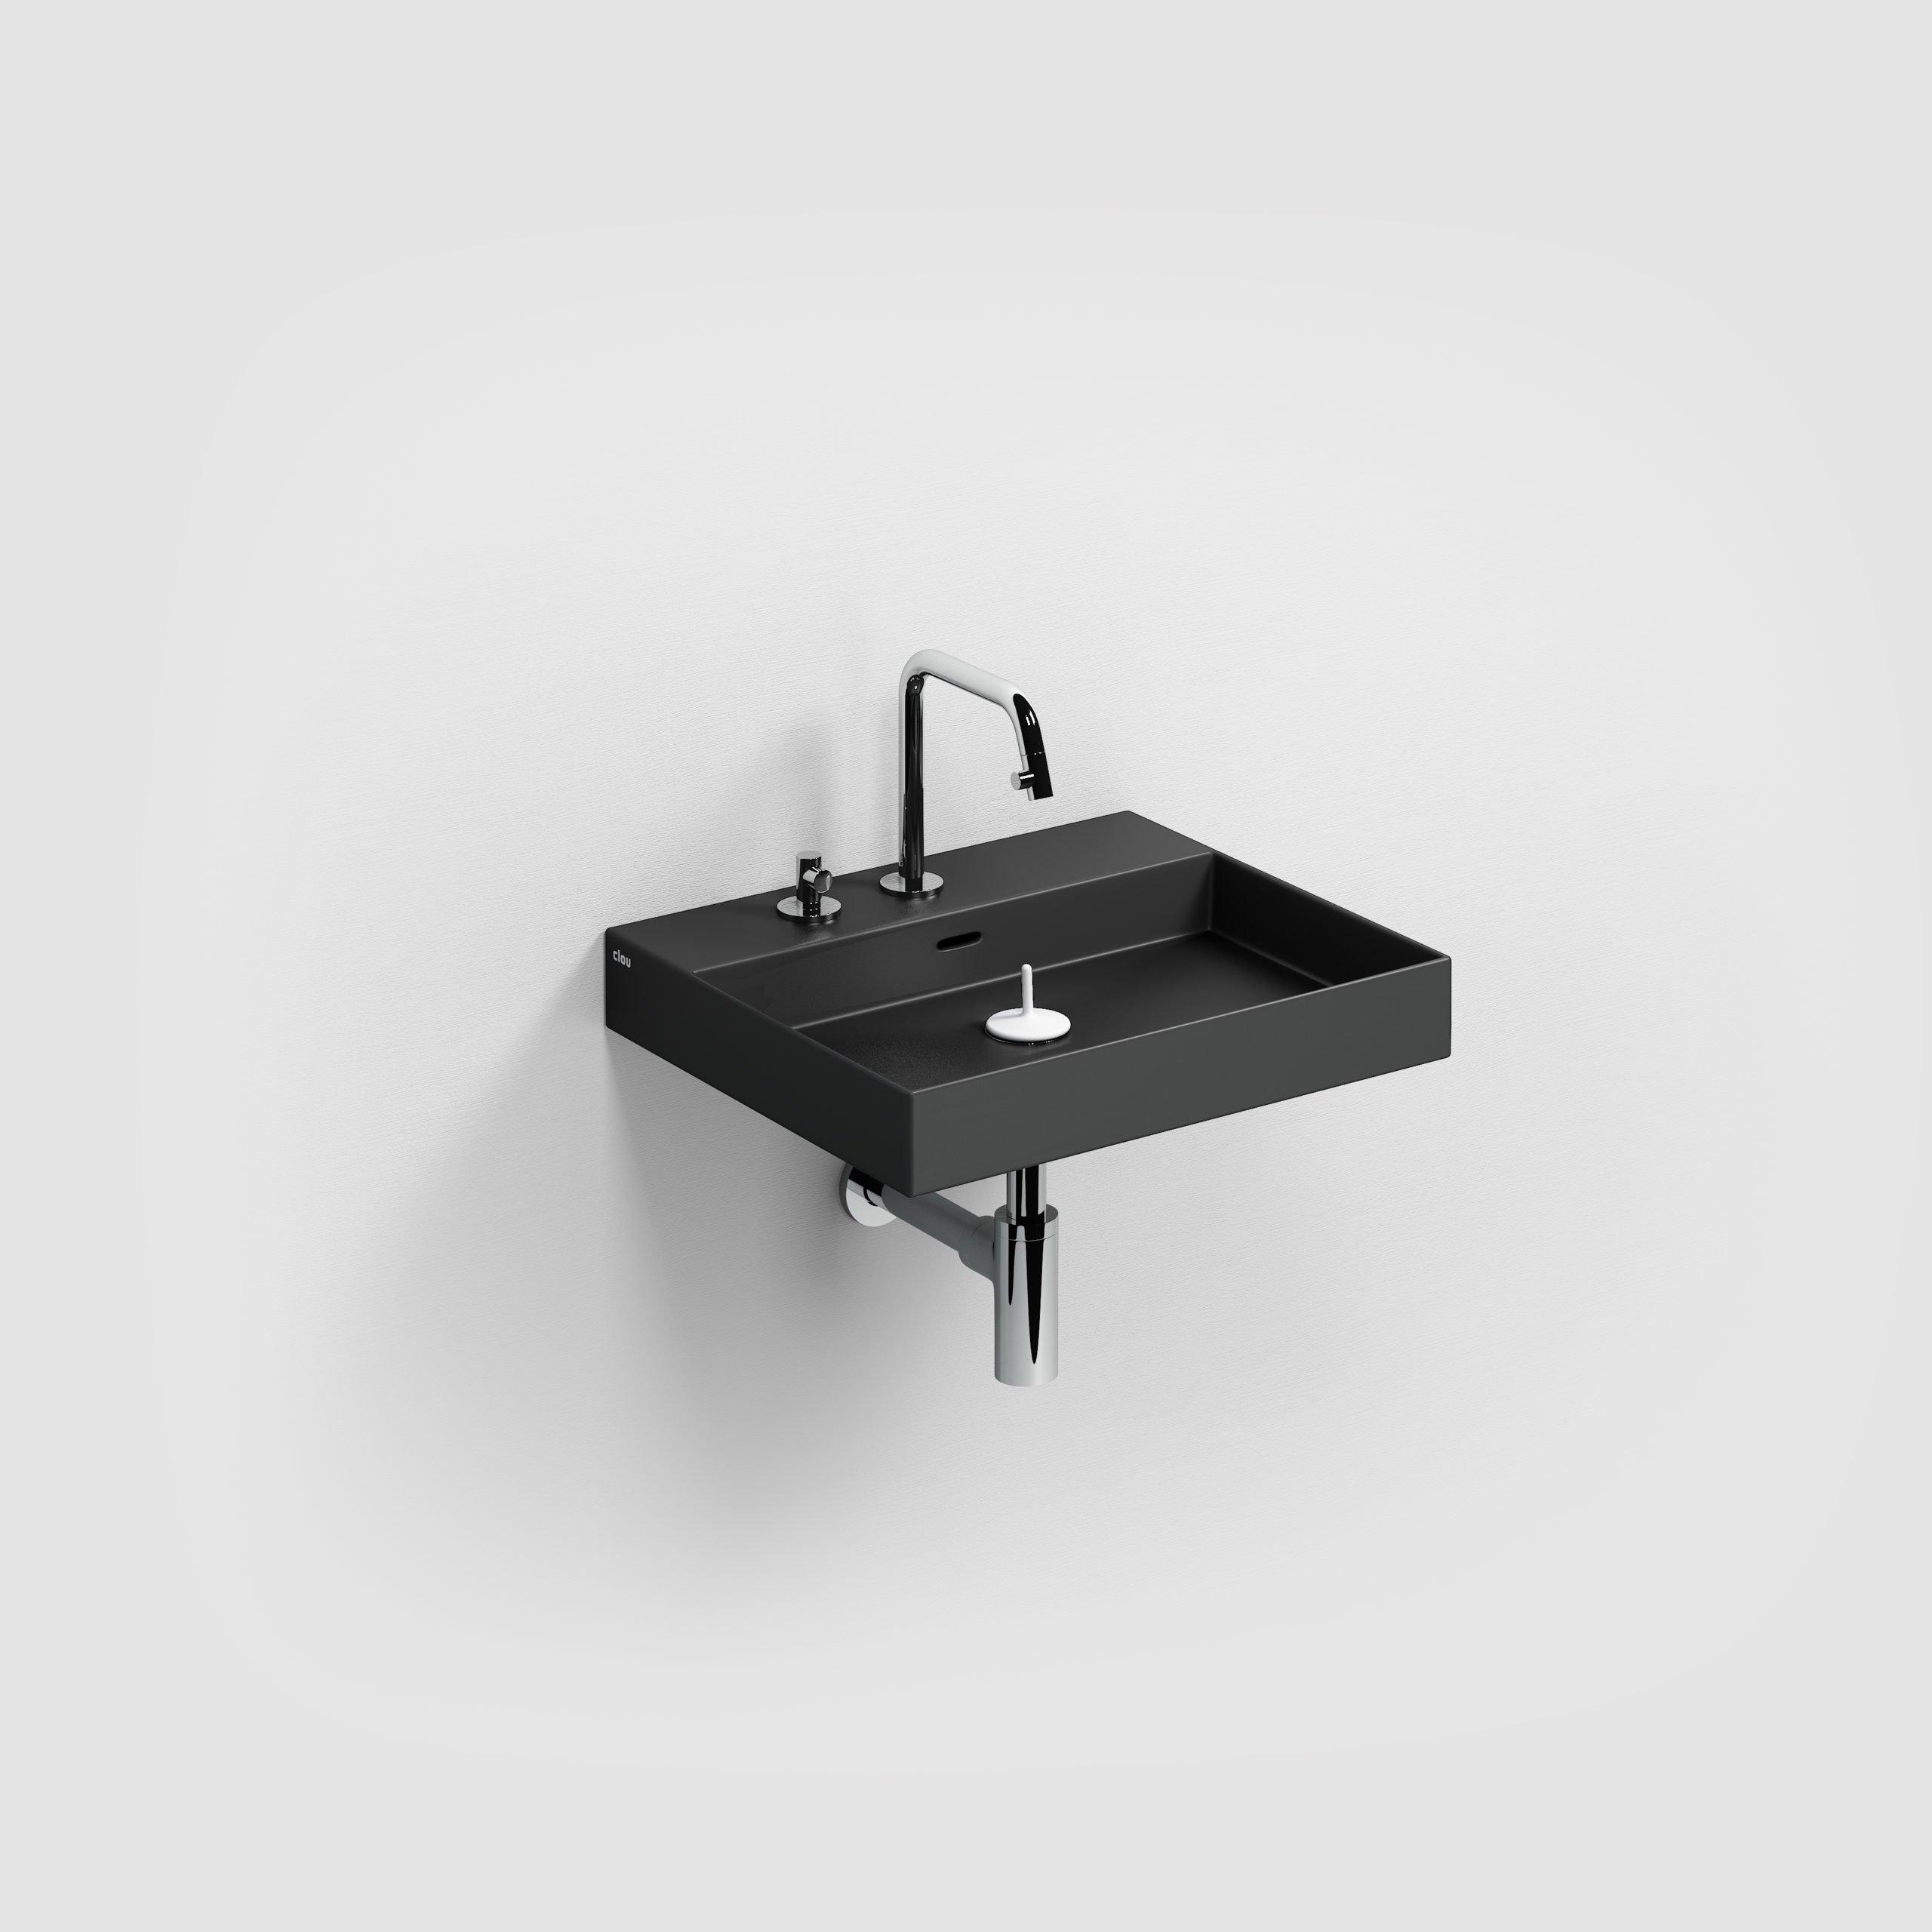 Clou New Wash Me wastafel 50cm, zonder plug, mat zwart keramiek